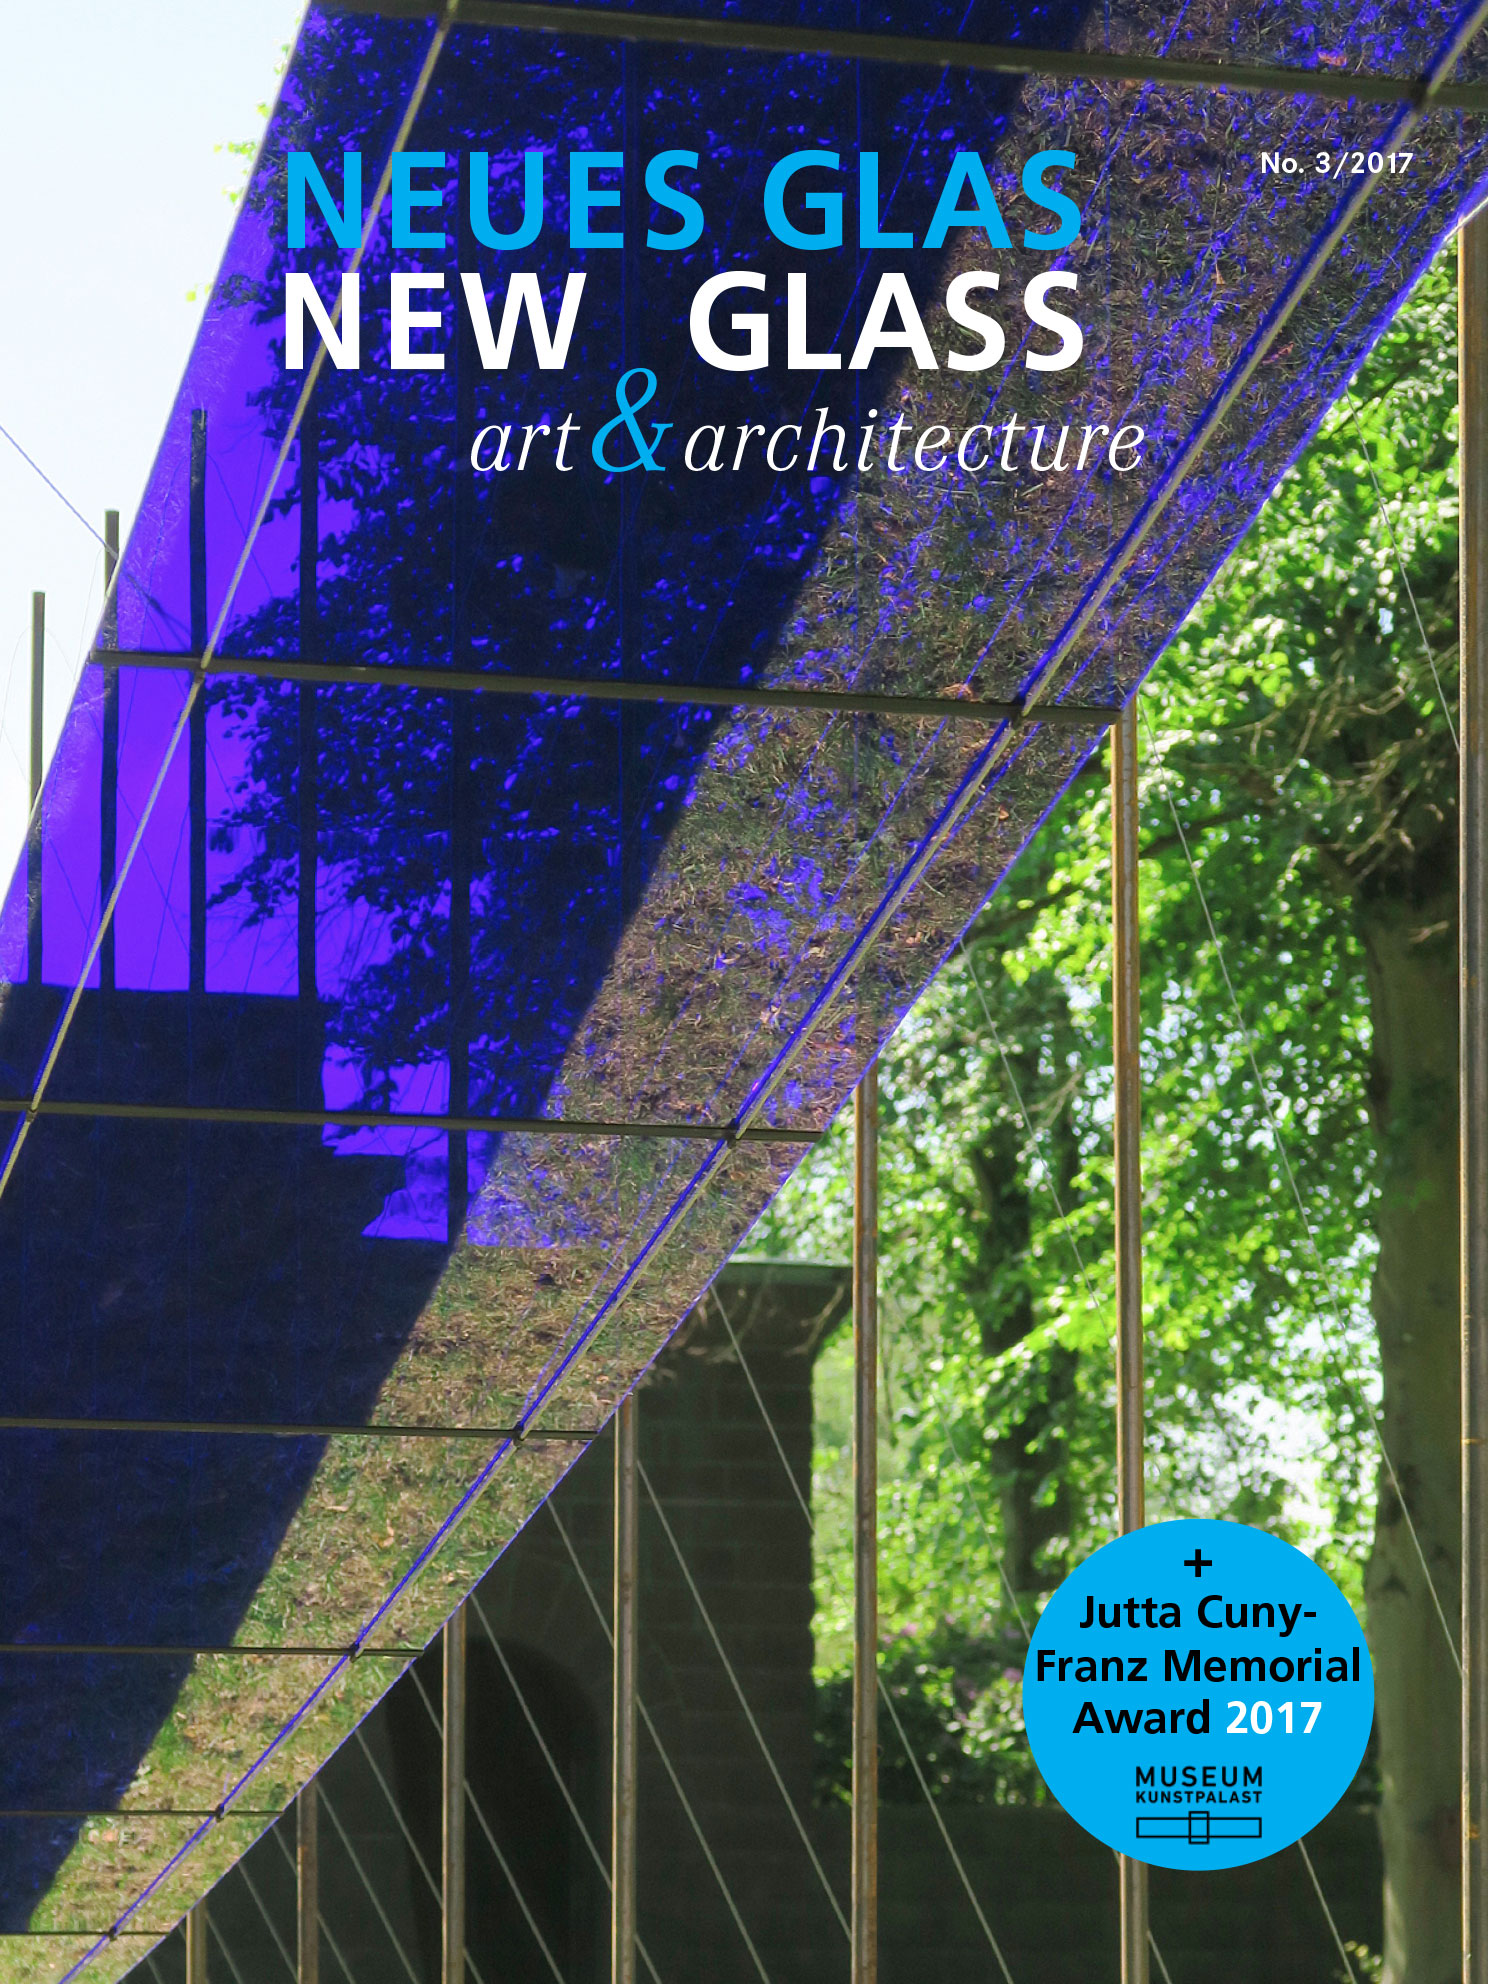 tn-Neues-Glas_03-2017